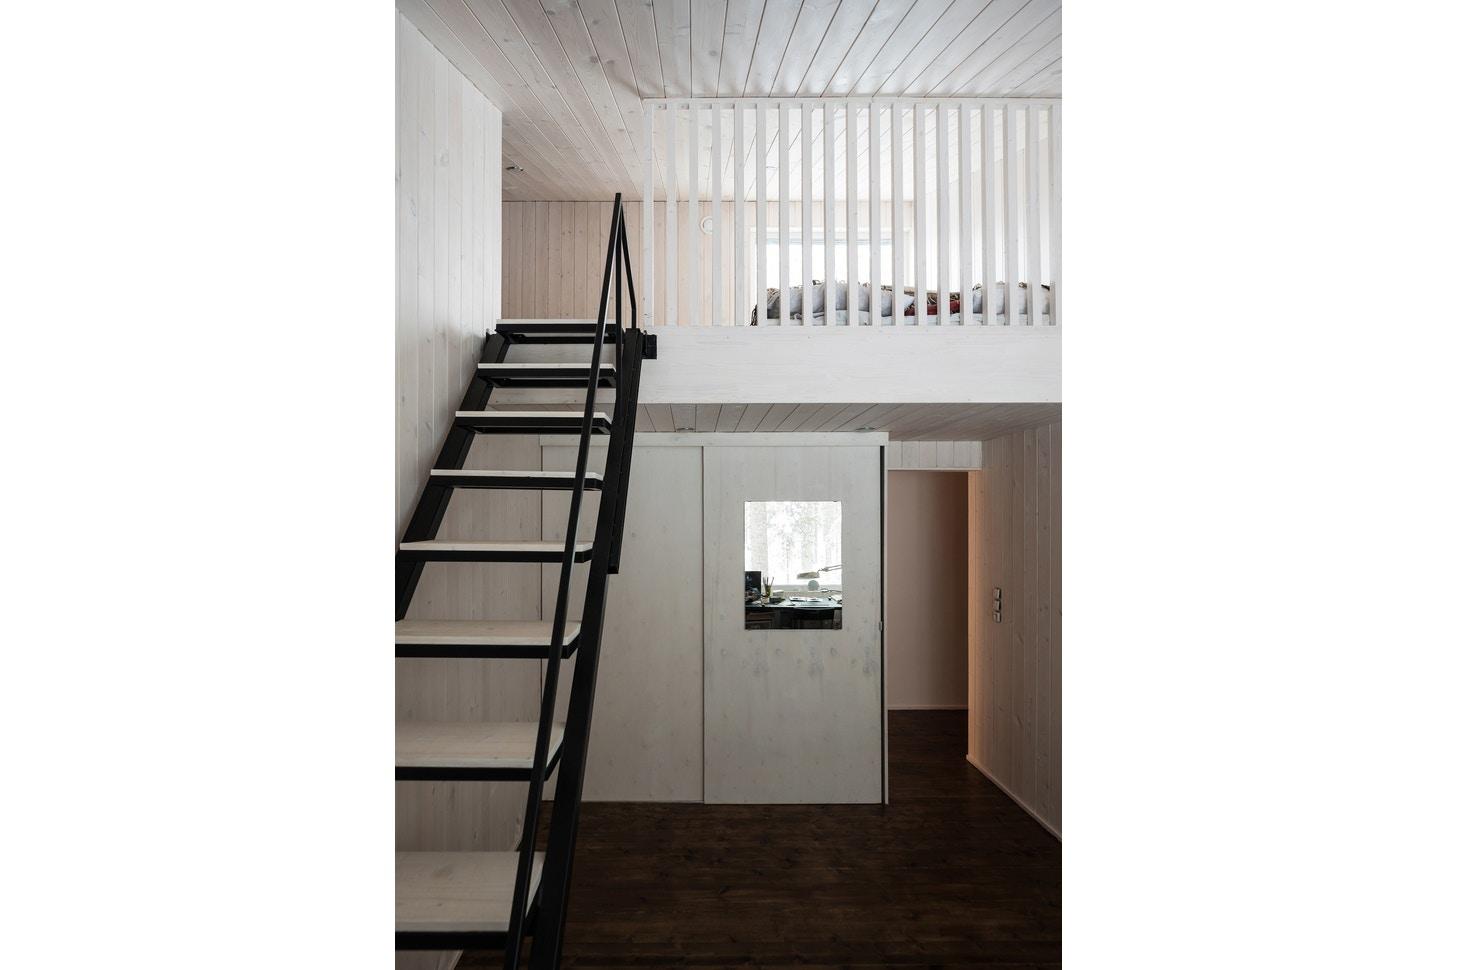 house-in-roschino-ab-chvoya-8.jpg